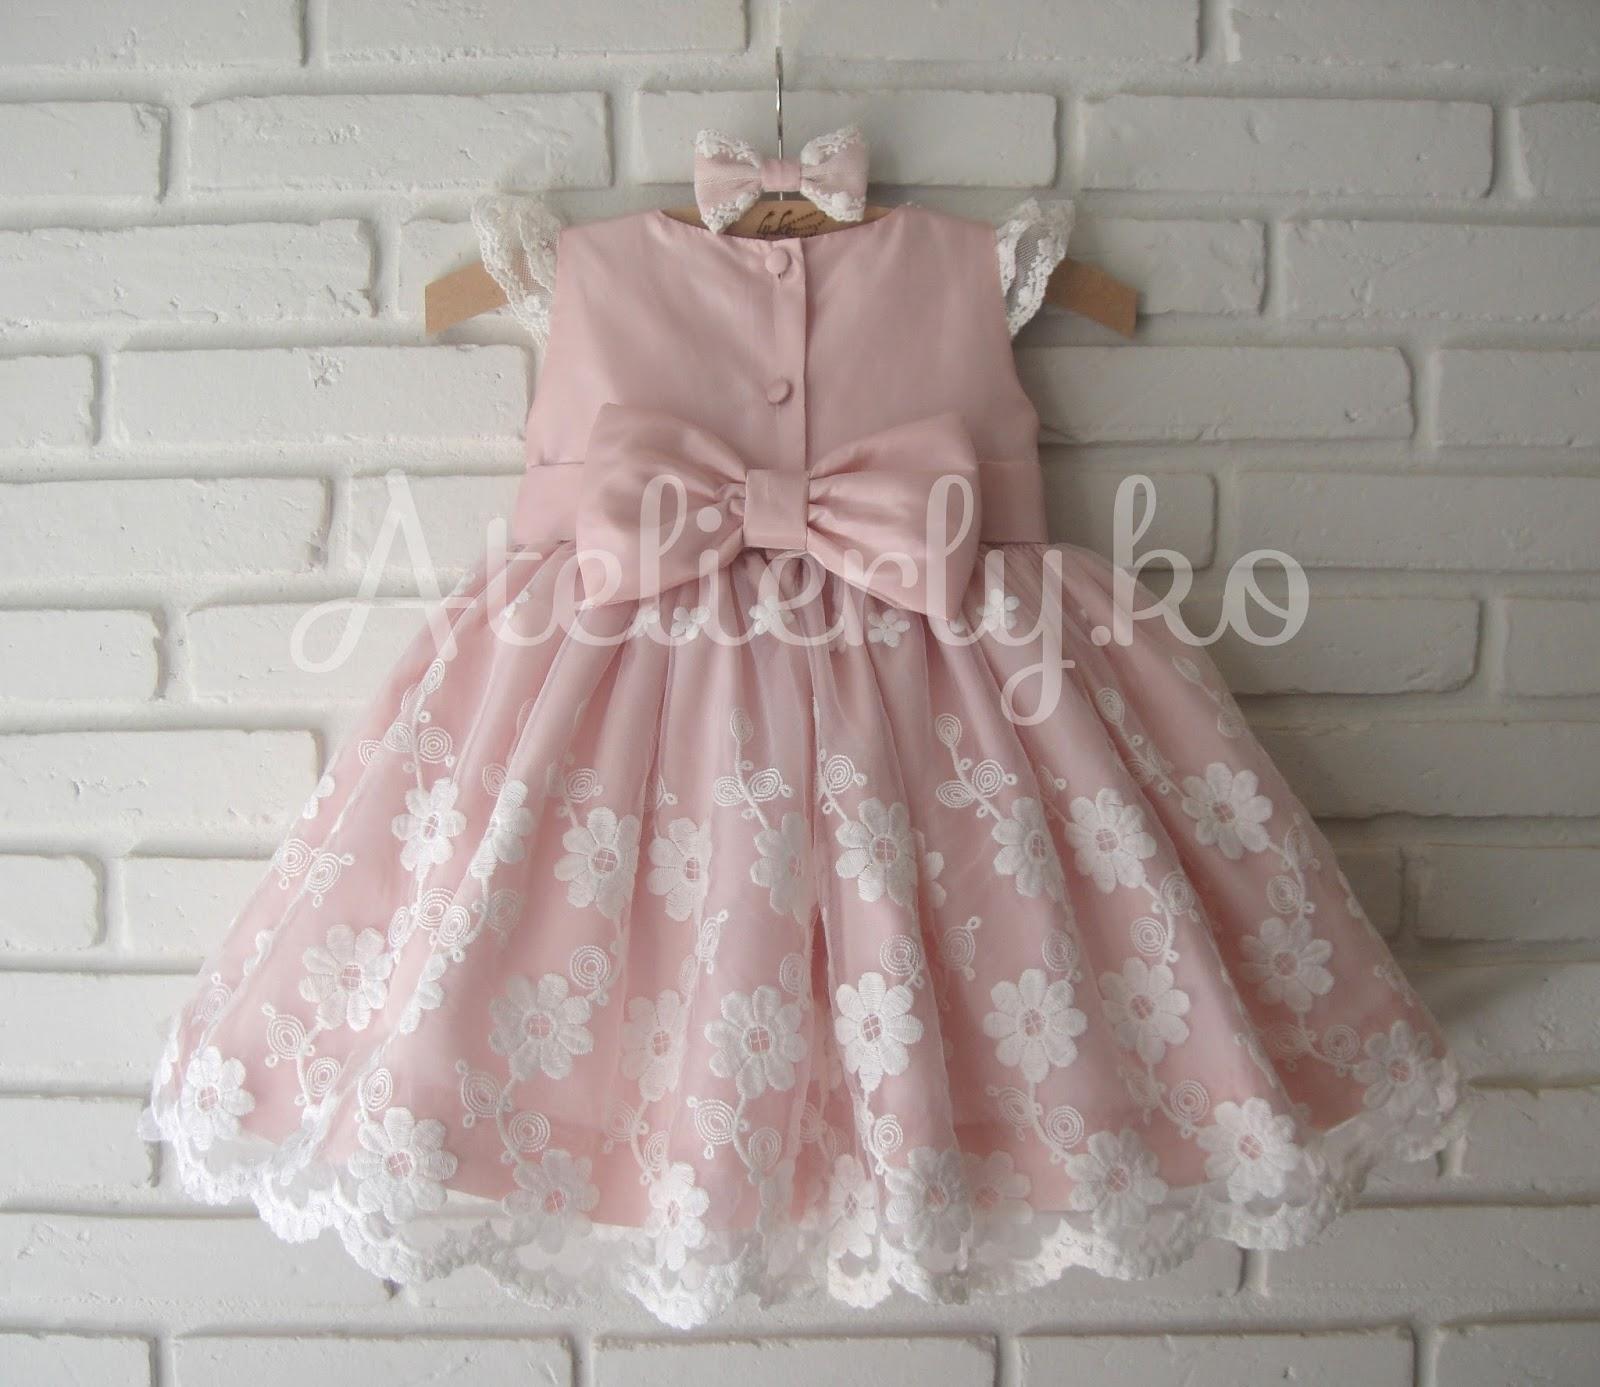 3215fb5f8 Atelier ly.ko: ly.ko fez: Vestido para a aniversariante Livia!!!